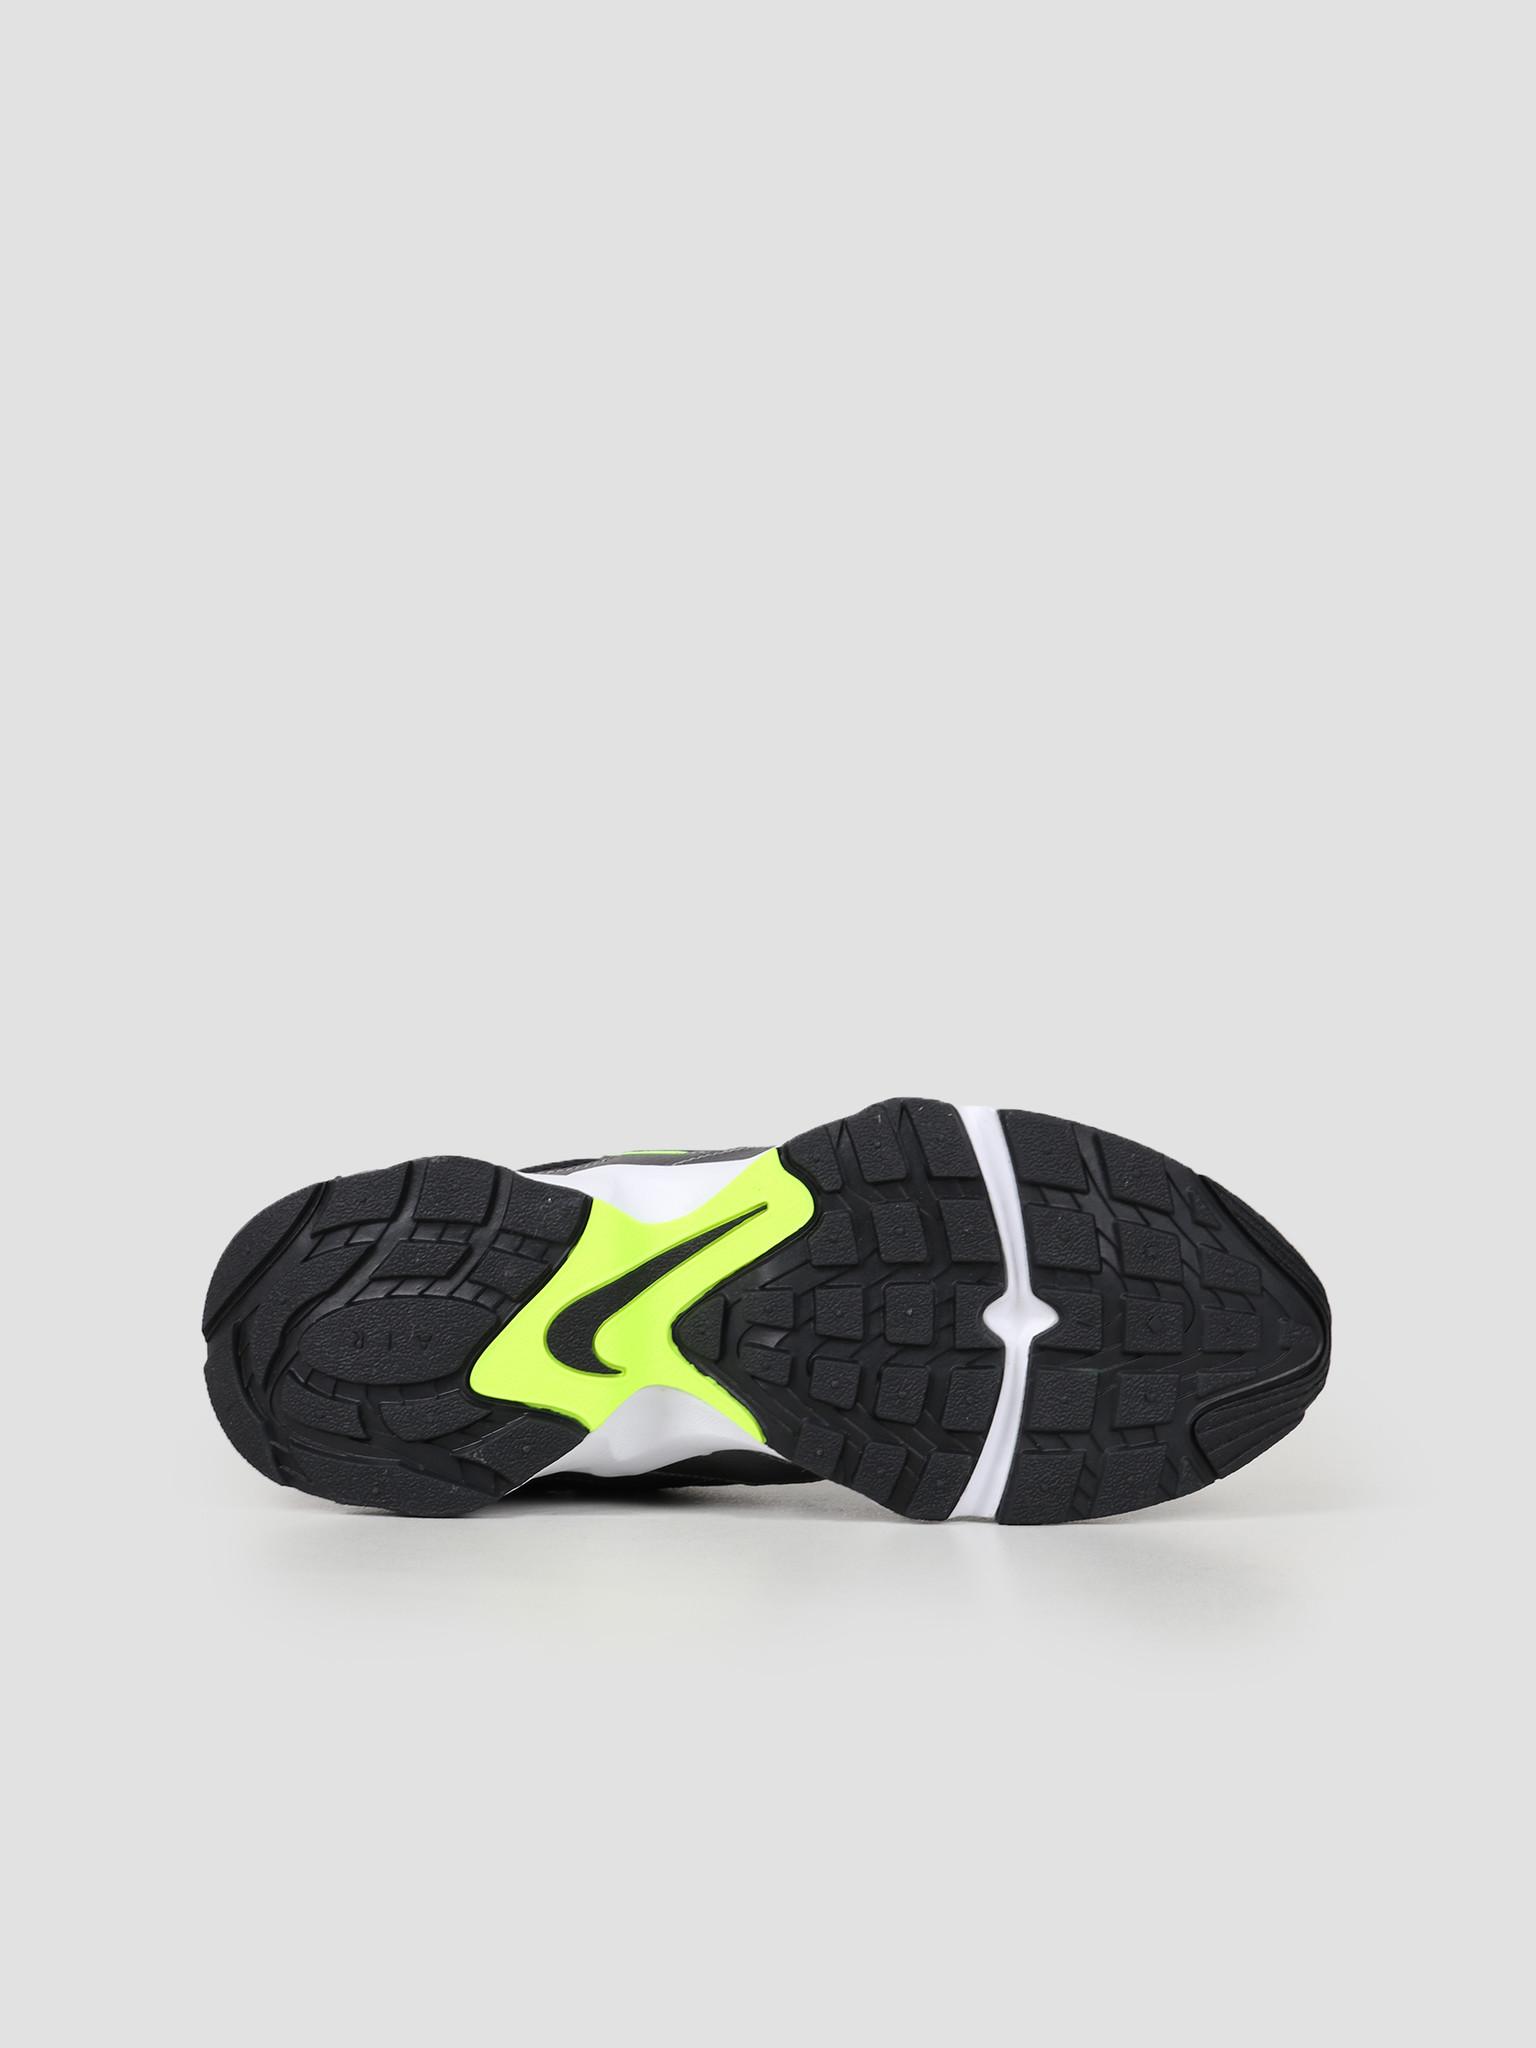 Nike Nike Air Heights Black Volt Mtlc Dark Grey White AT4522 006